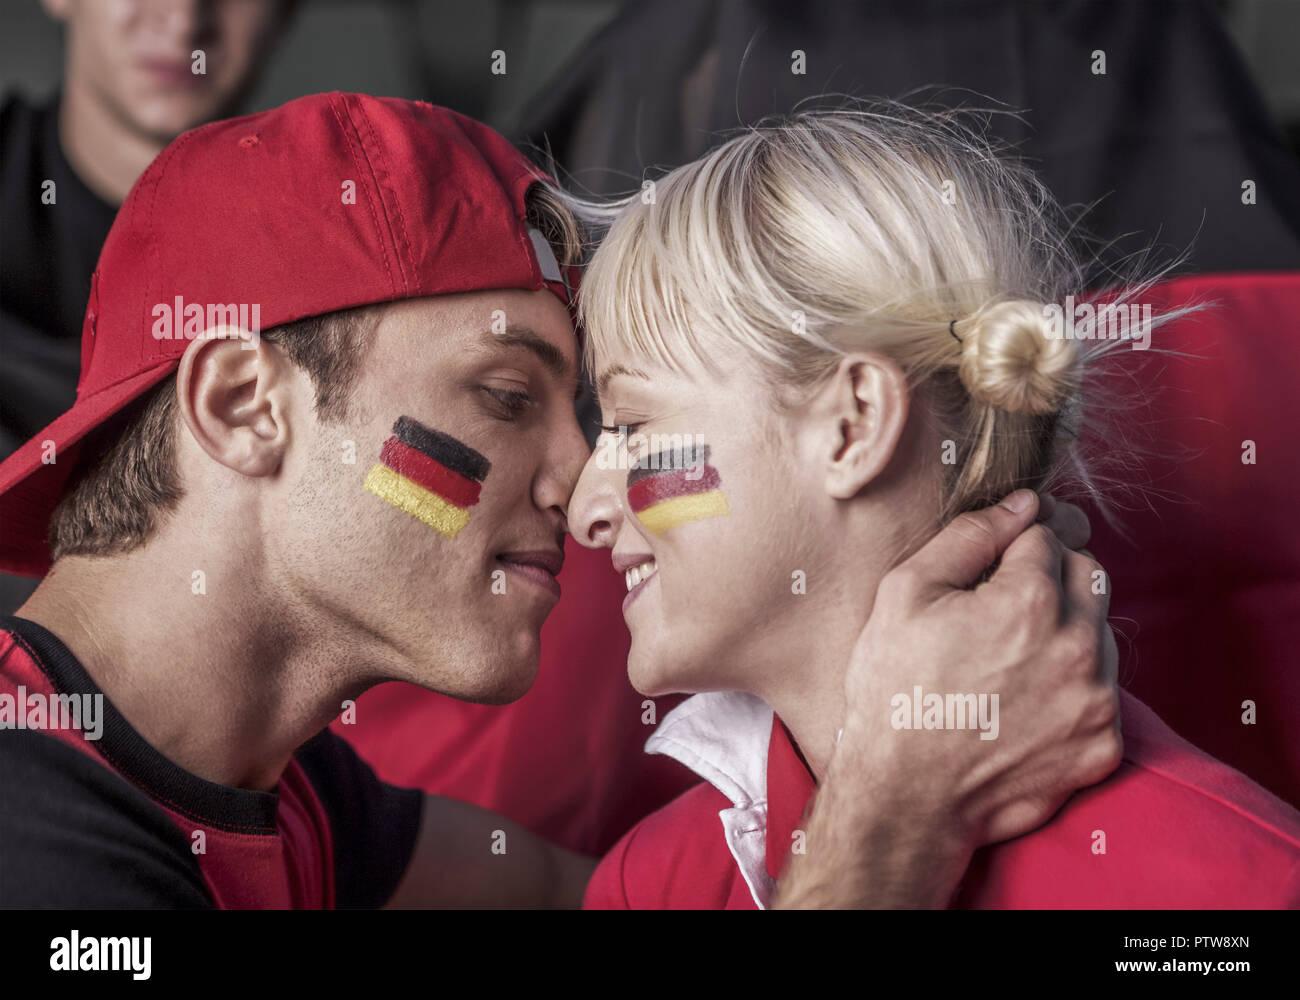 Deutsche Fussballfans, Paerchen (model-released) - Stock Image